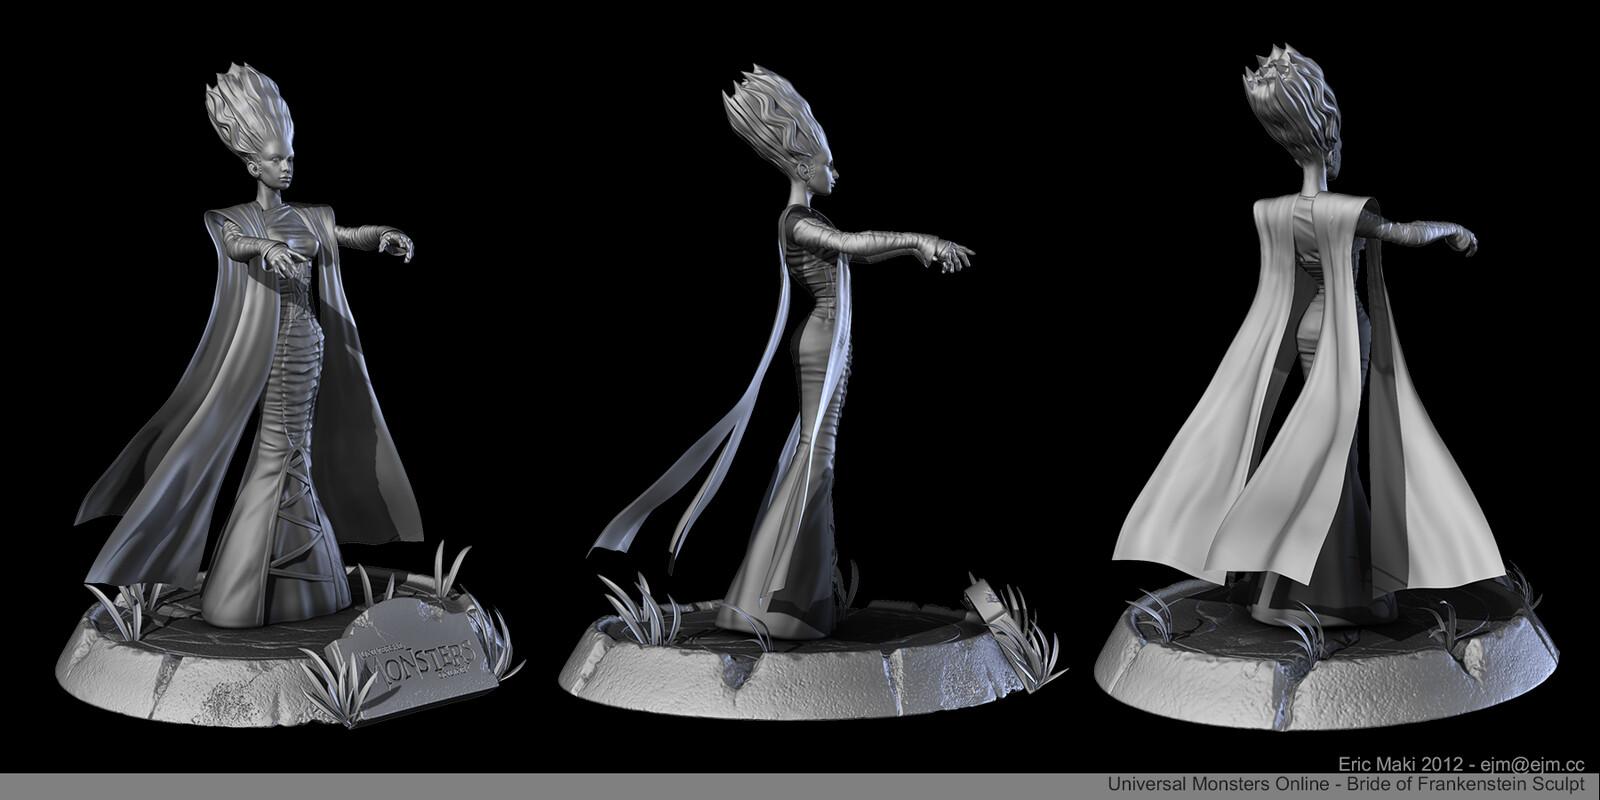 Bride of Frankenstein Sculpt